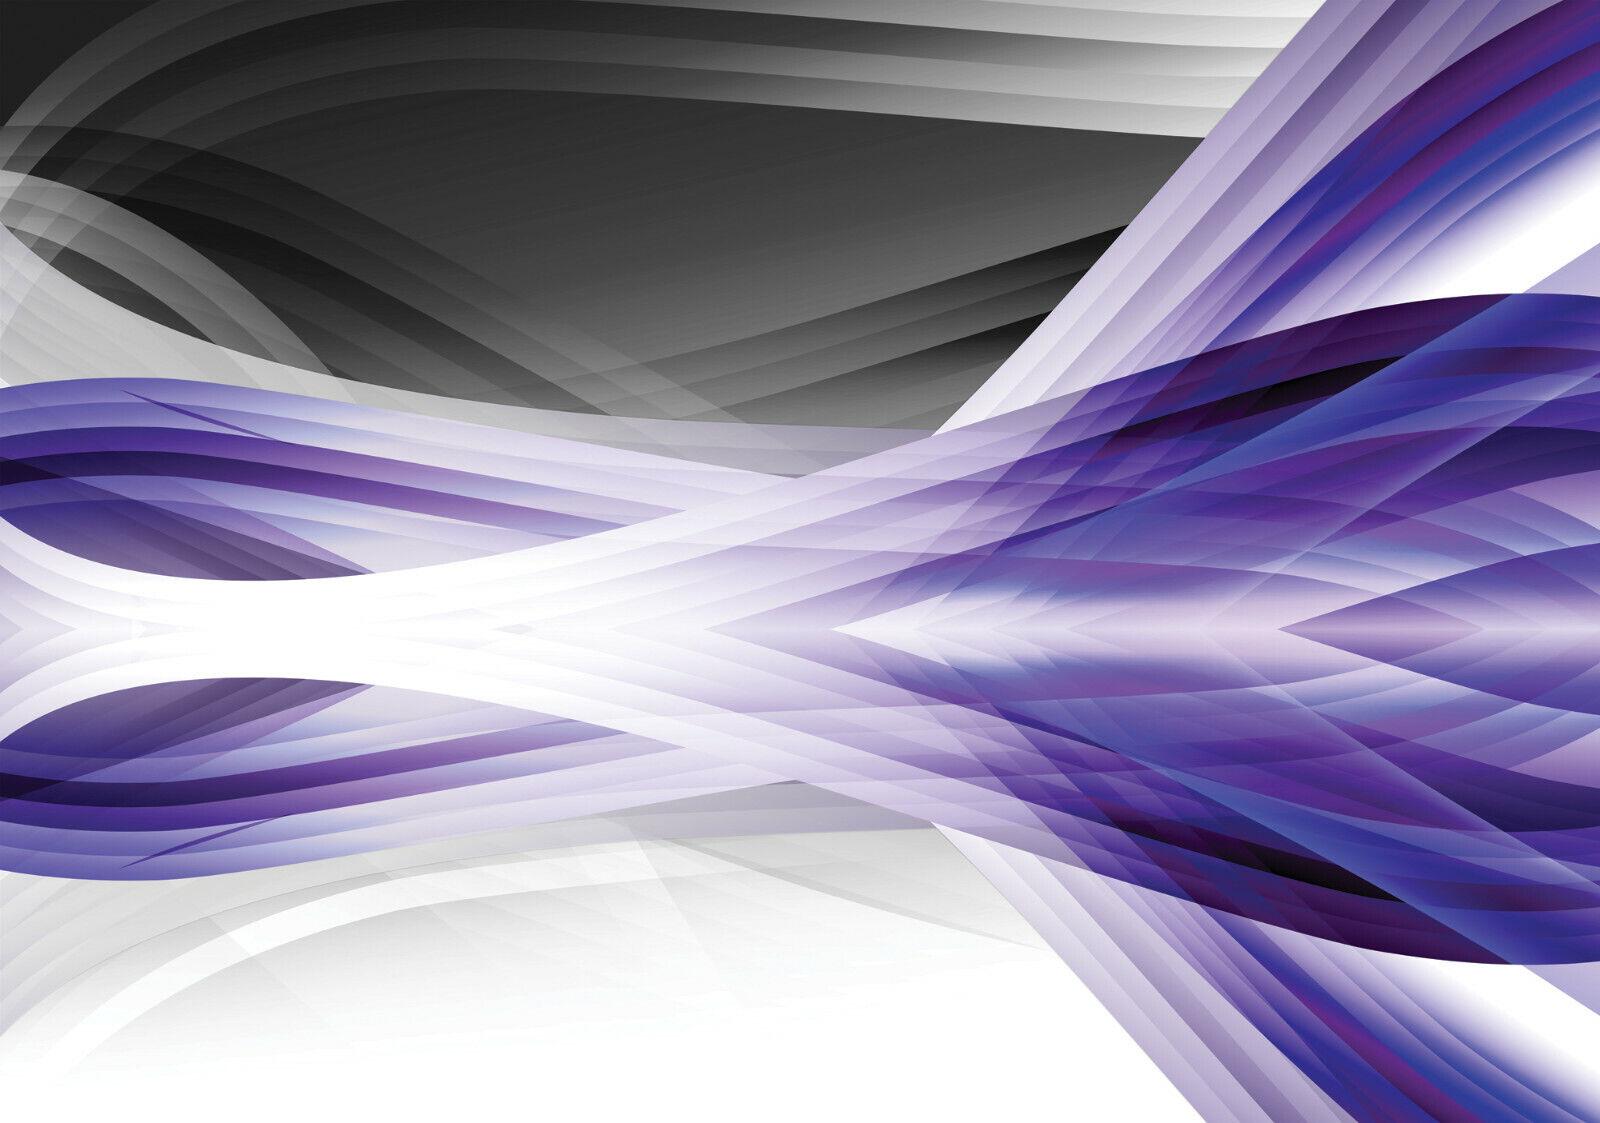 VLIES Fototapete-ABSTRAKT DESIGN-(2591)-Welle Illusion Optik Muster Lila Dekor